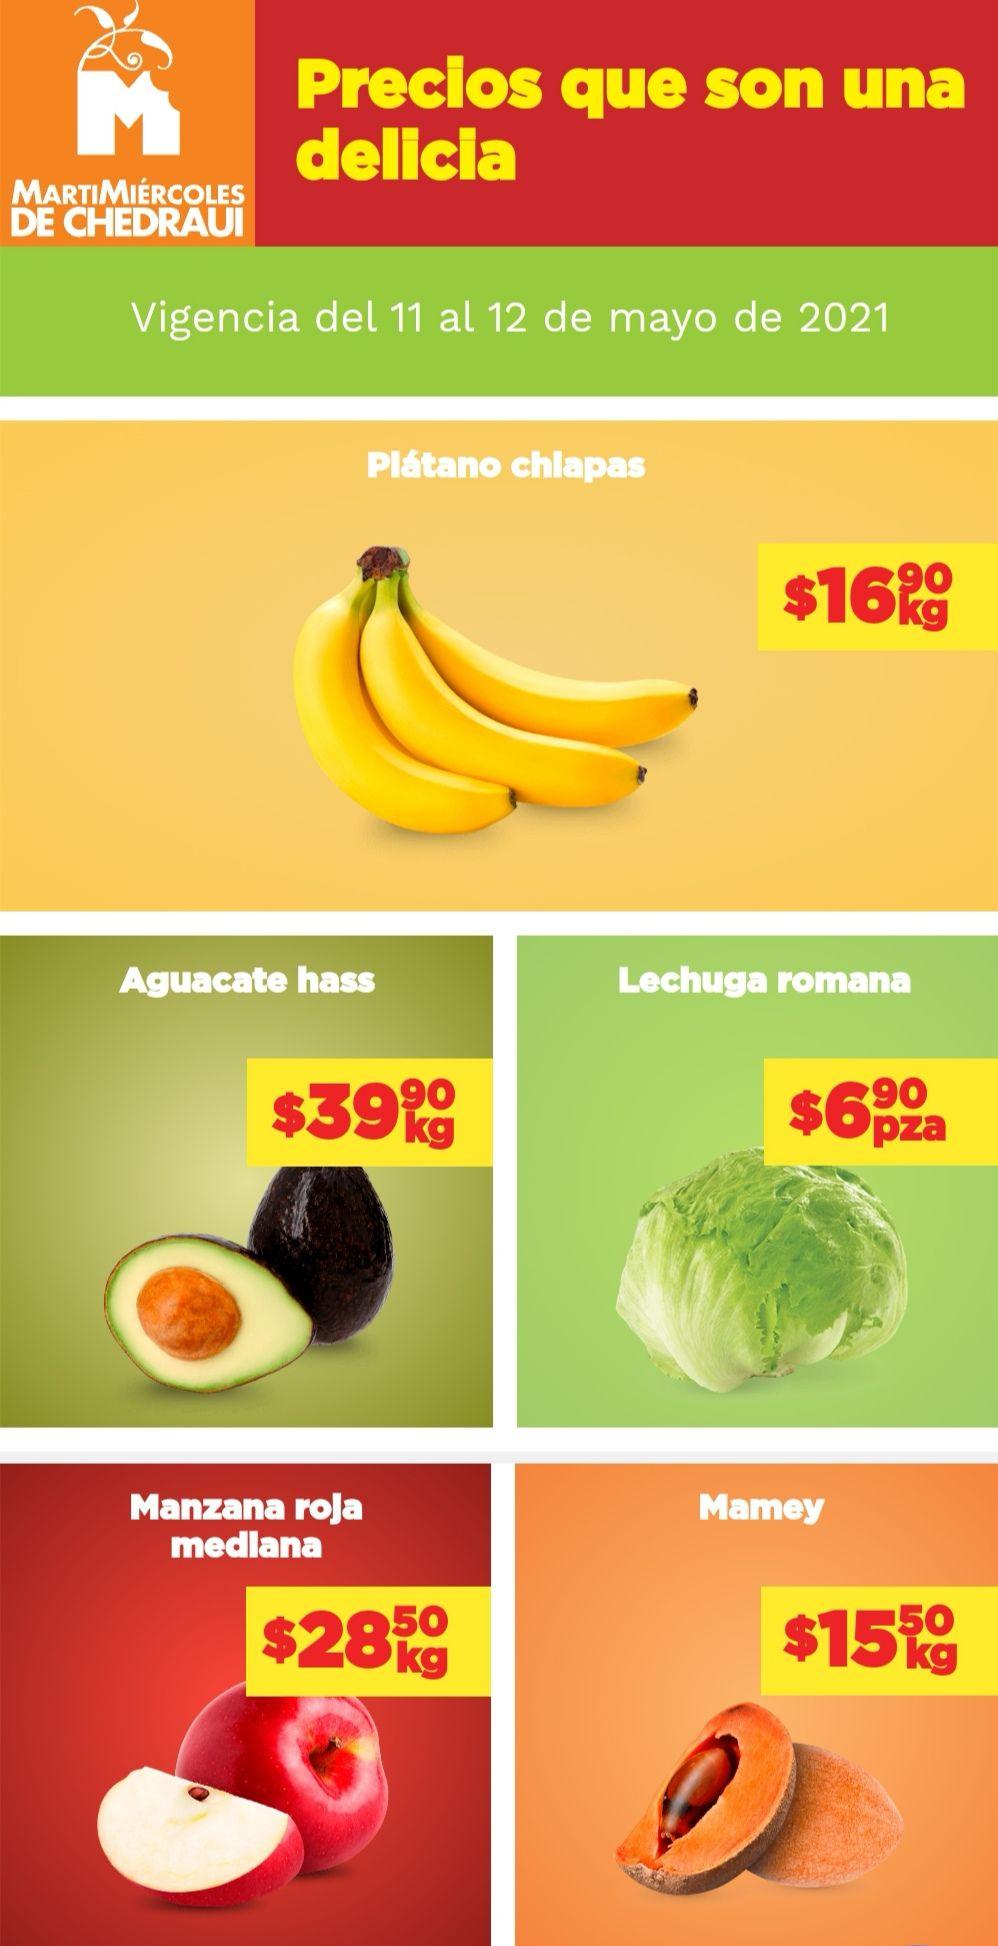 Chedraui: MartiMiércoles de Chedraui 11 y 12 Mayo: Lechuga $6.90 pza... Plátano $16.90 kg... Manzana Roja $28.50 kg... Aguacate $39.90 kg.